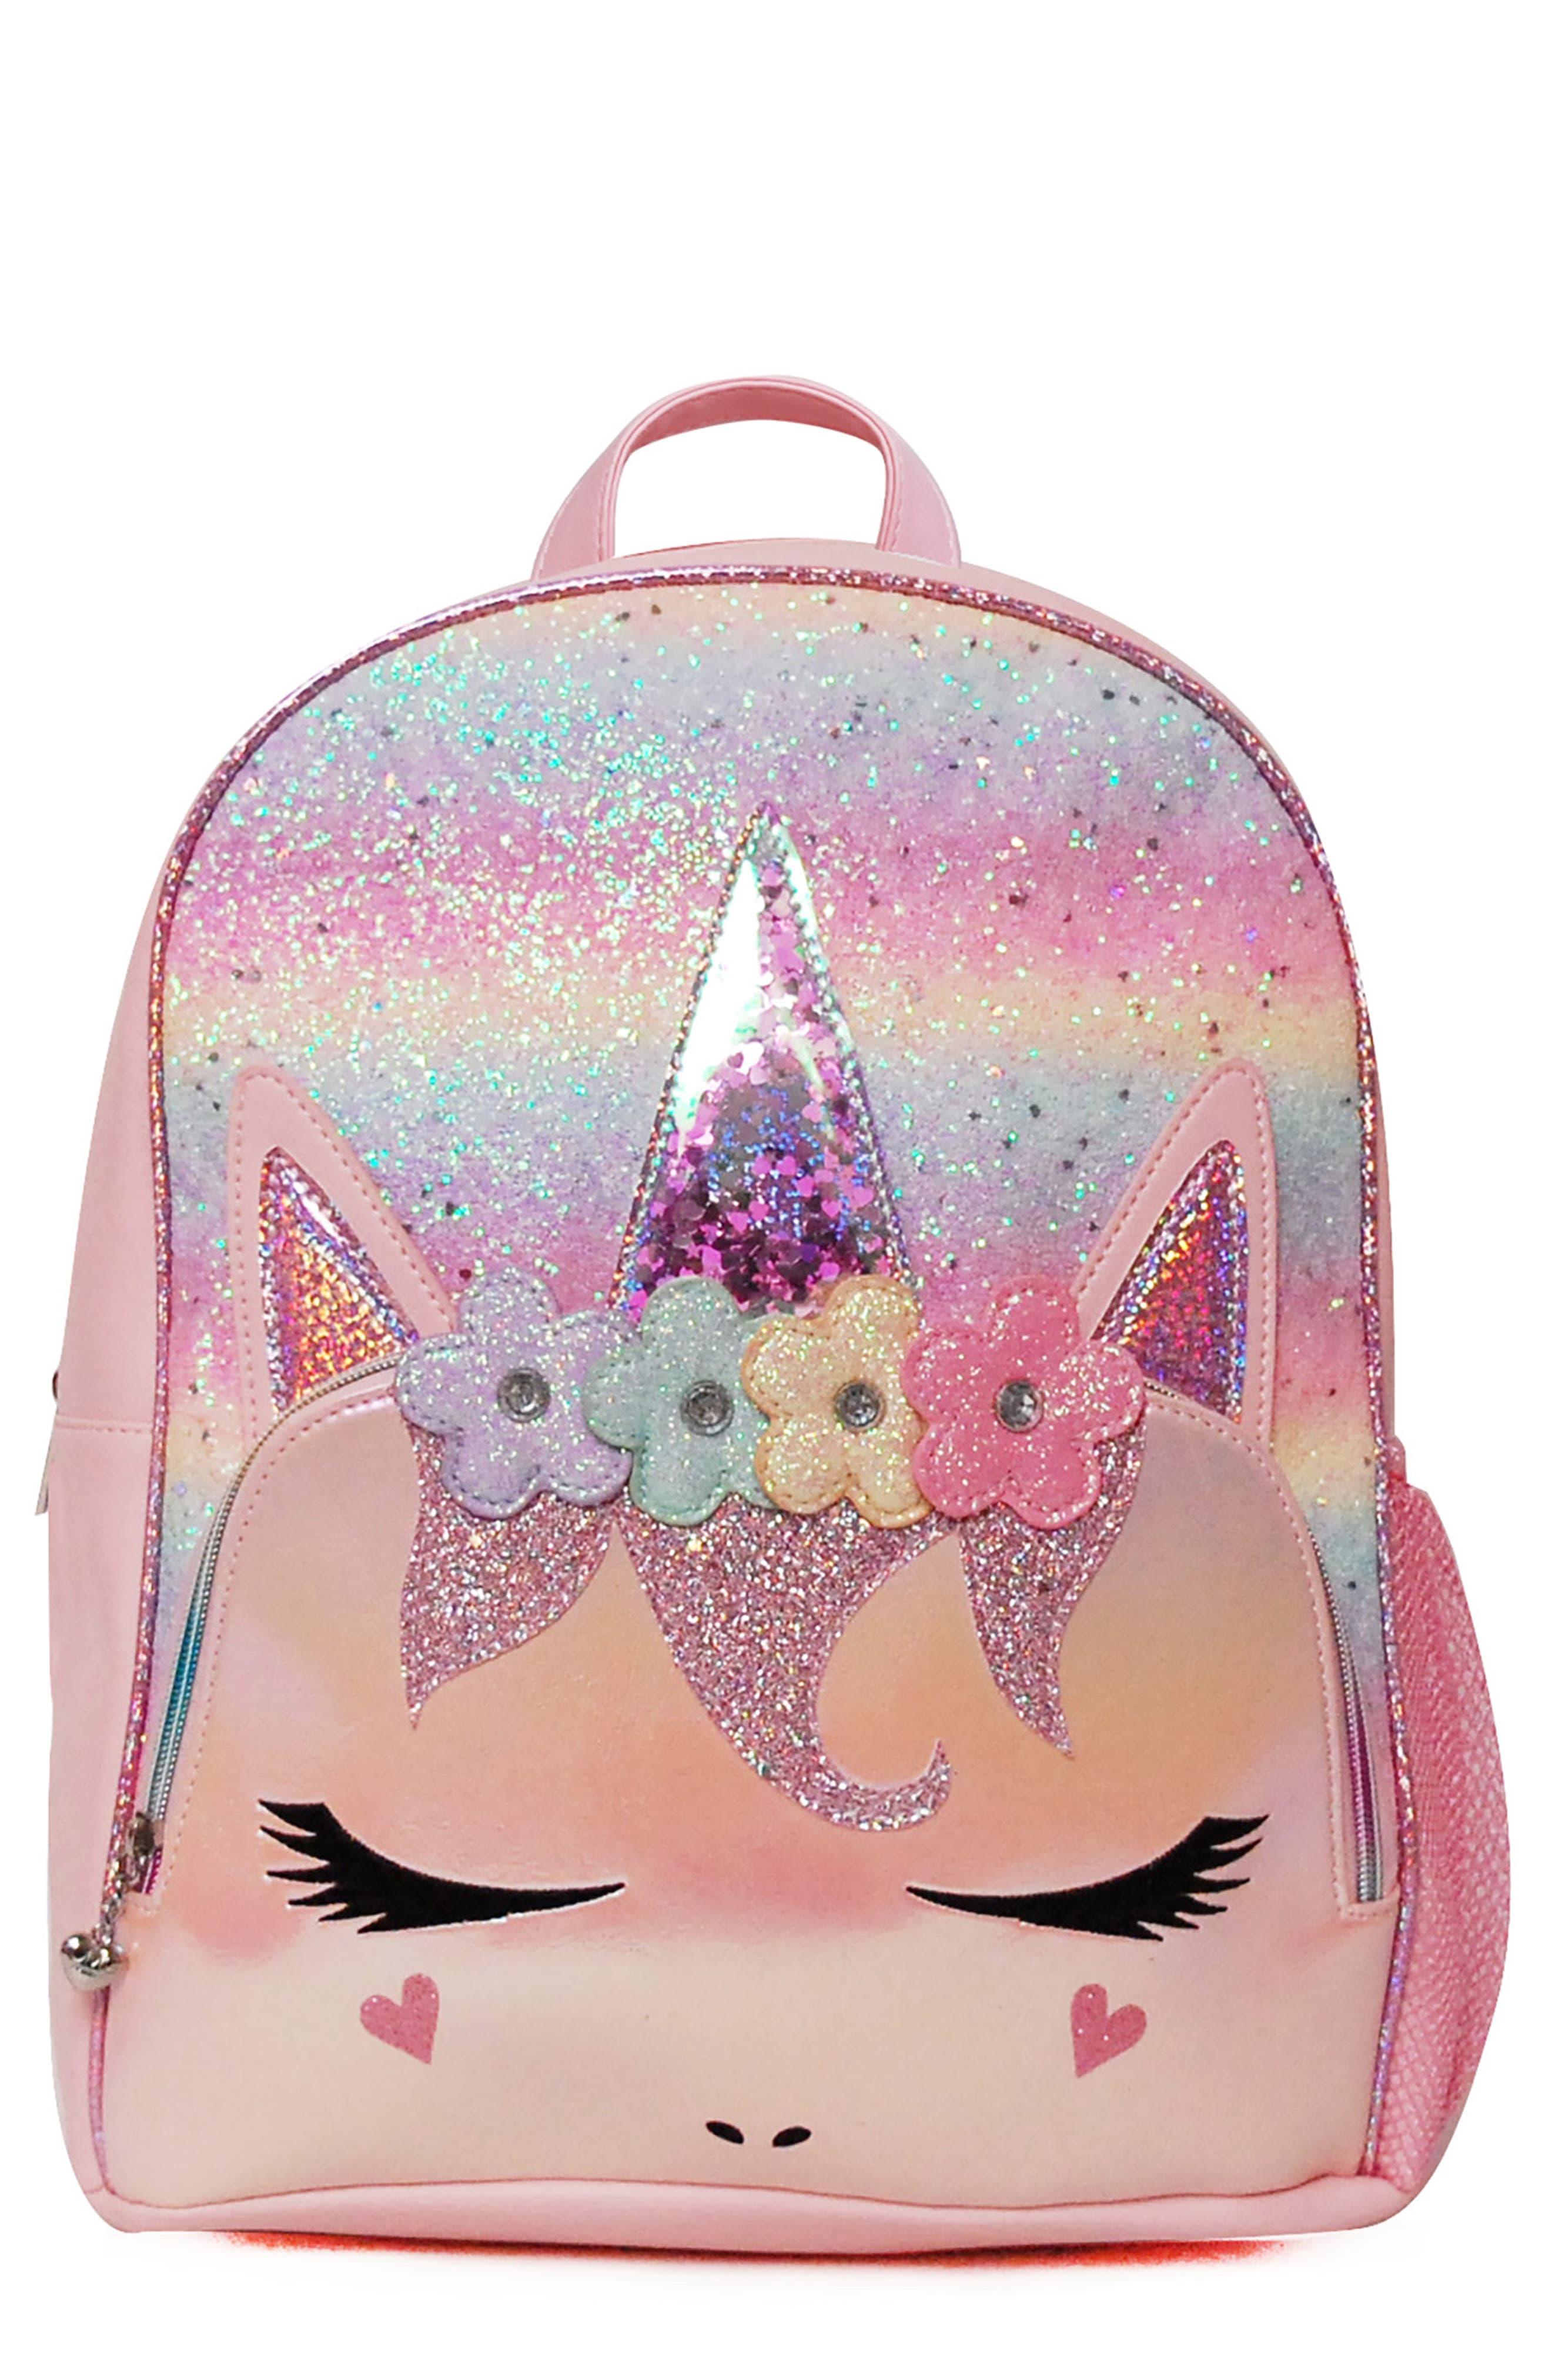 OMG Accessories Girl's Omg Flower Crown Miss Gwen Unicorn Backpack - Pink